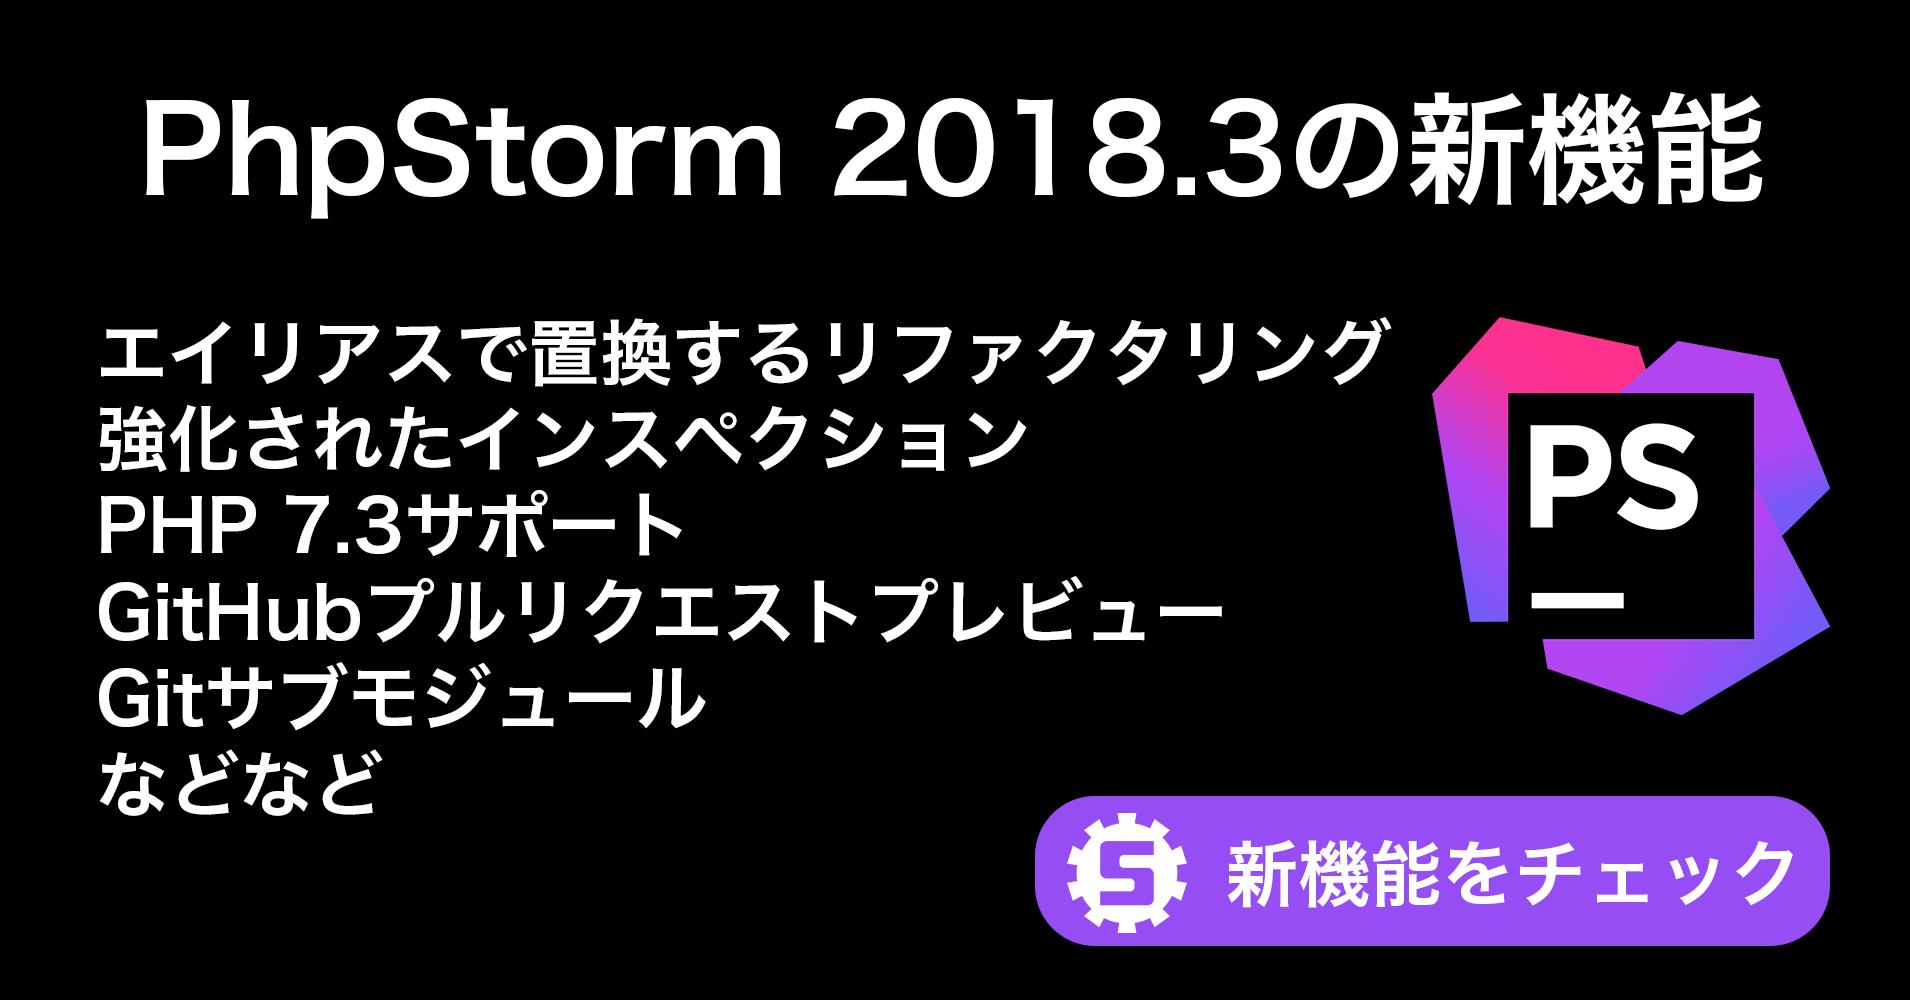 PhpStorm 2018.3の新機能